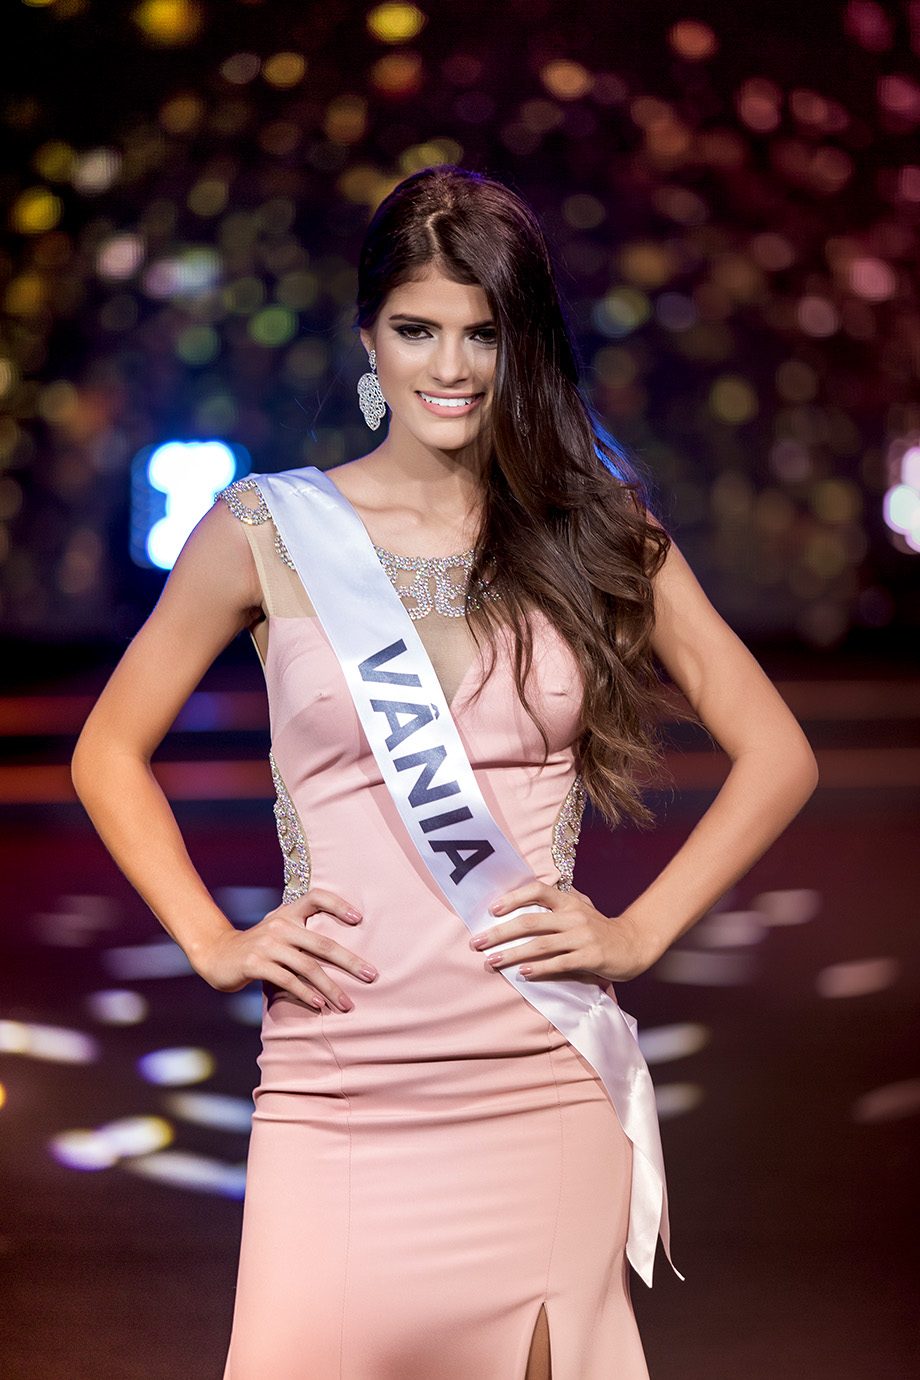 Blog Cris Moreira - Miss Fortaleza 2016 - 13